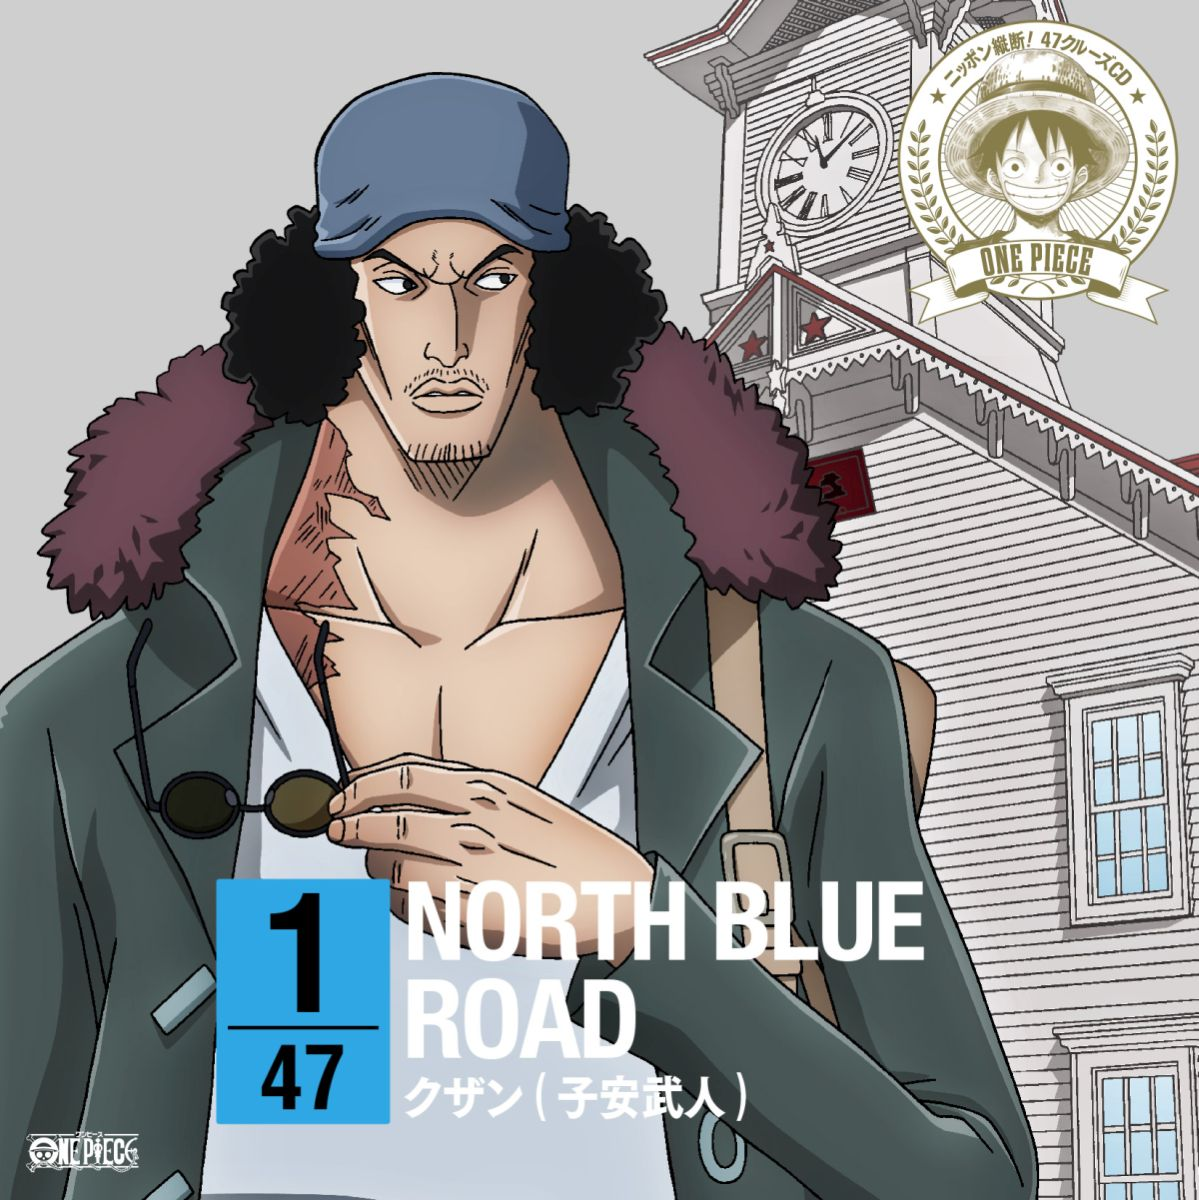 ONE PIECE ニッポン縦断! 47クルーズCD in 北海道 NORTH BLUE ROAD画像